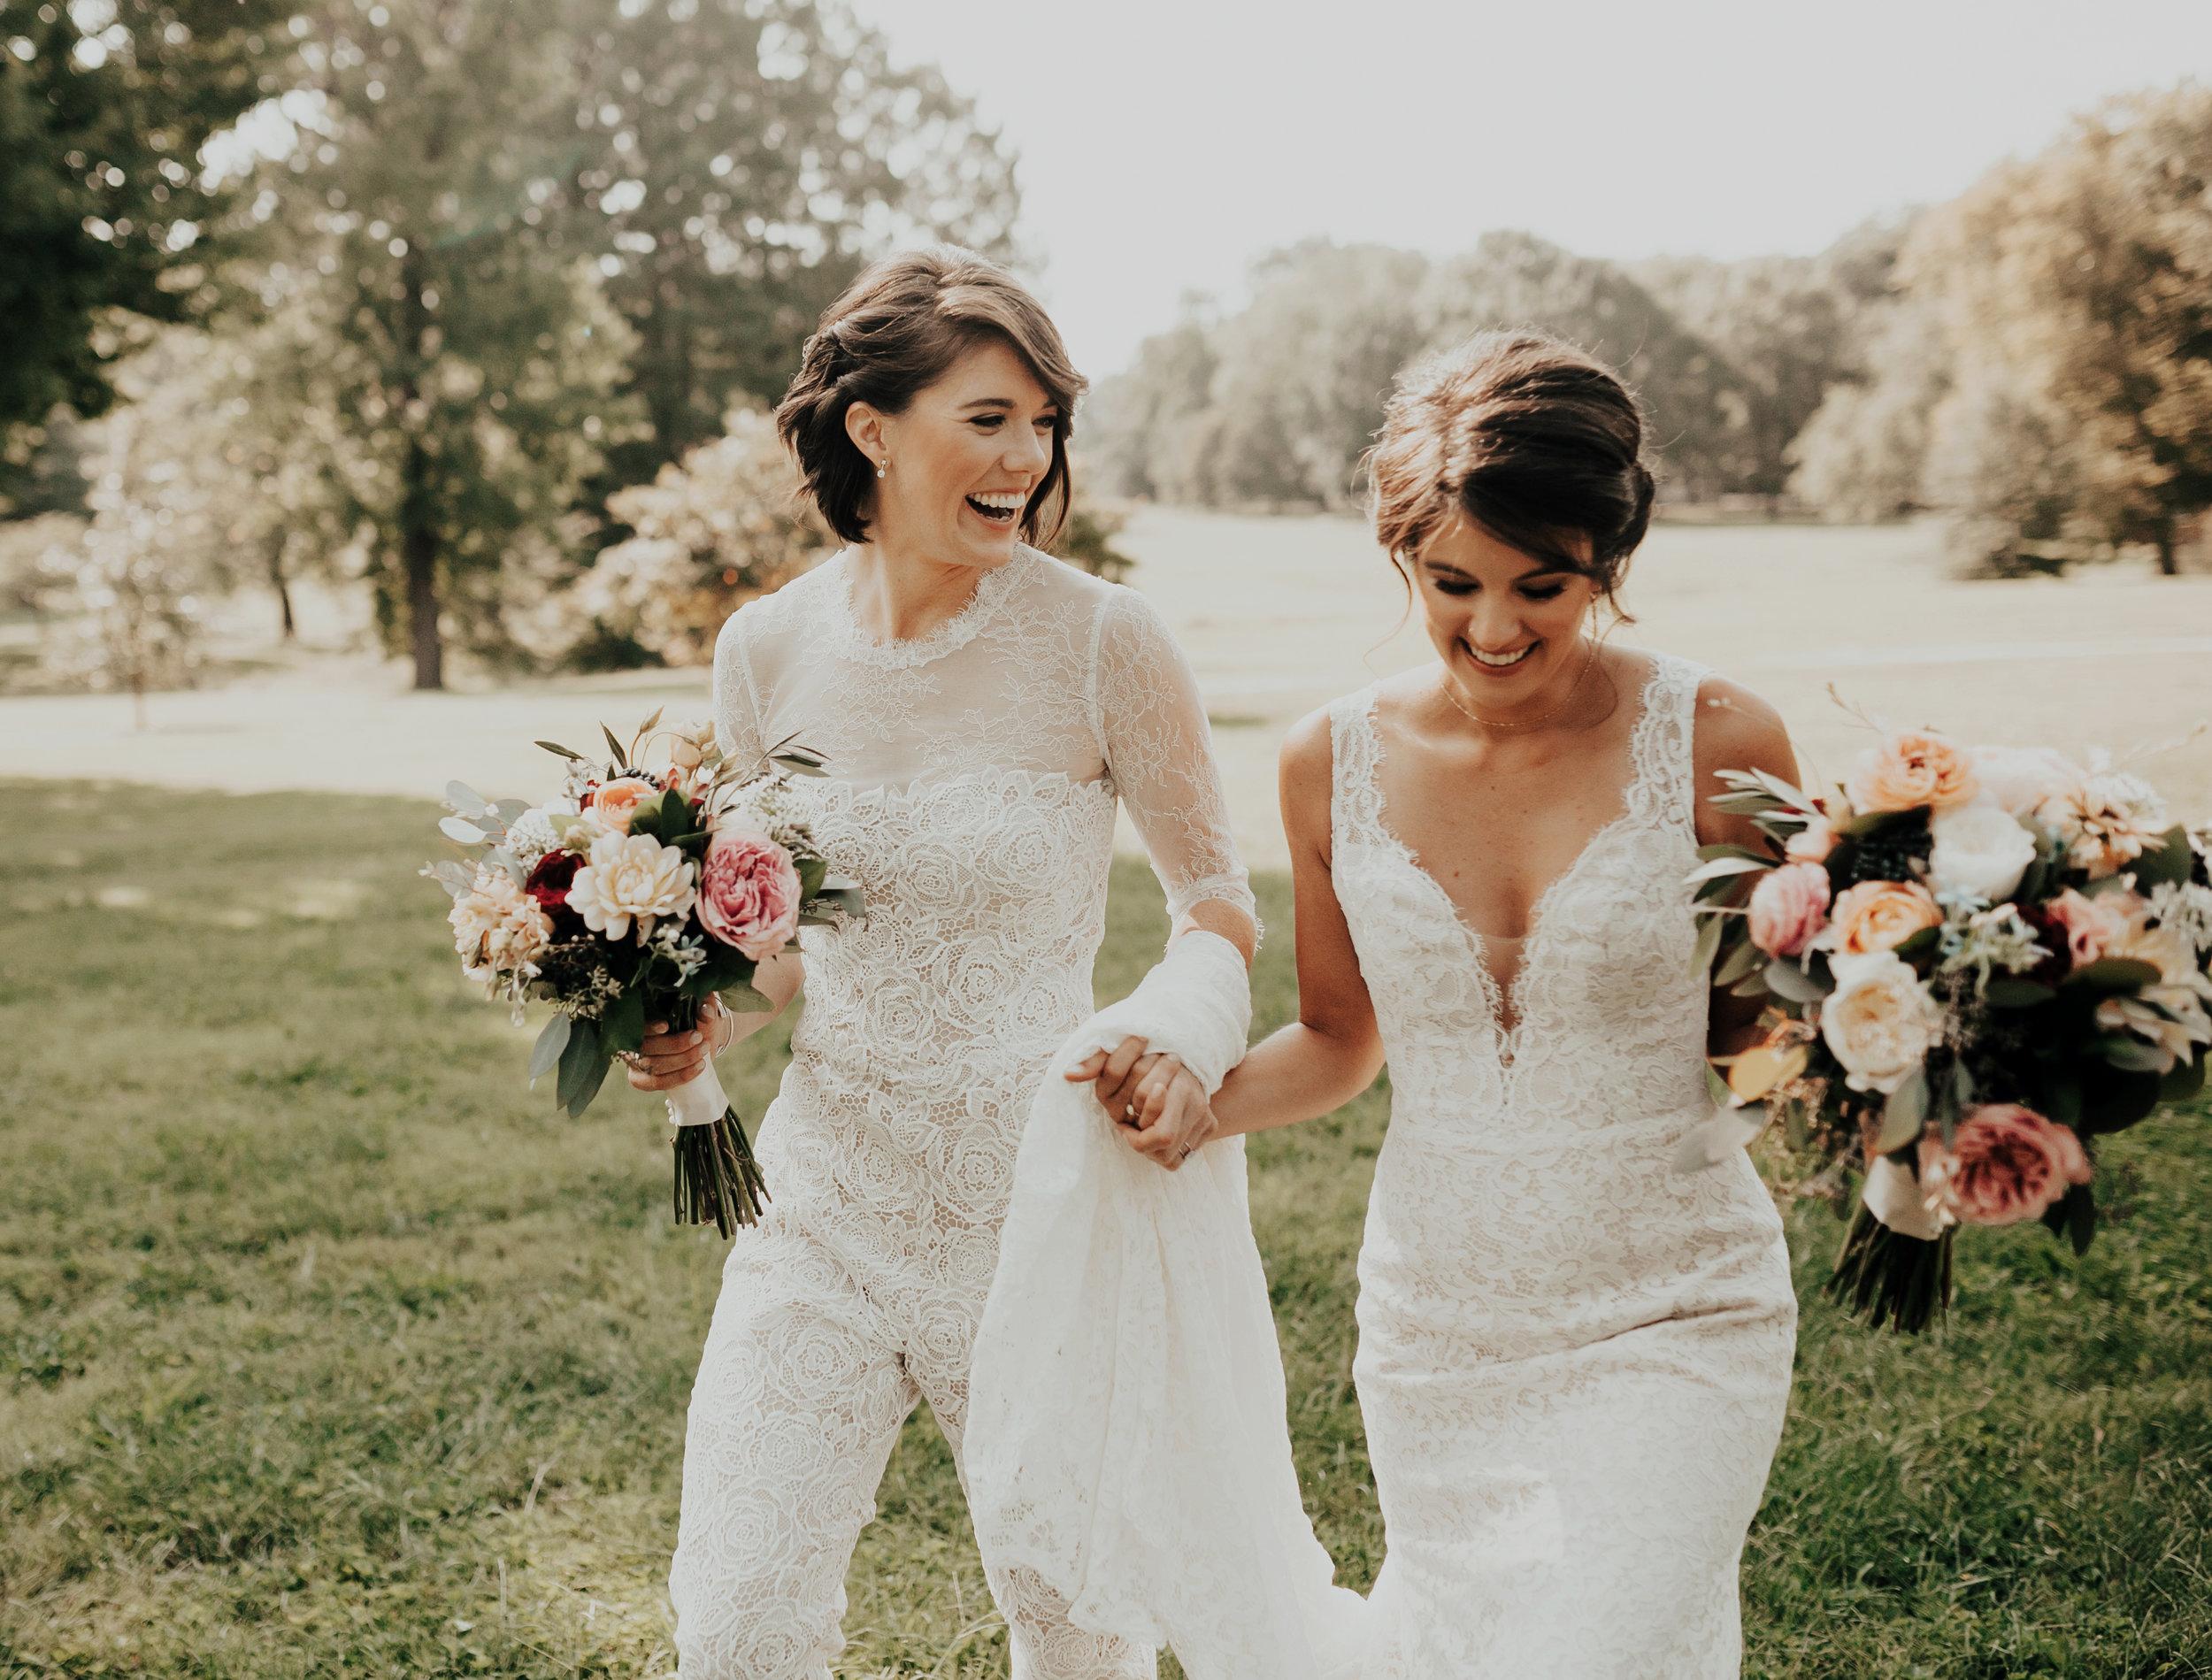 los angeles same sex wedding